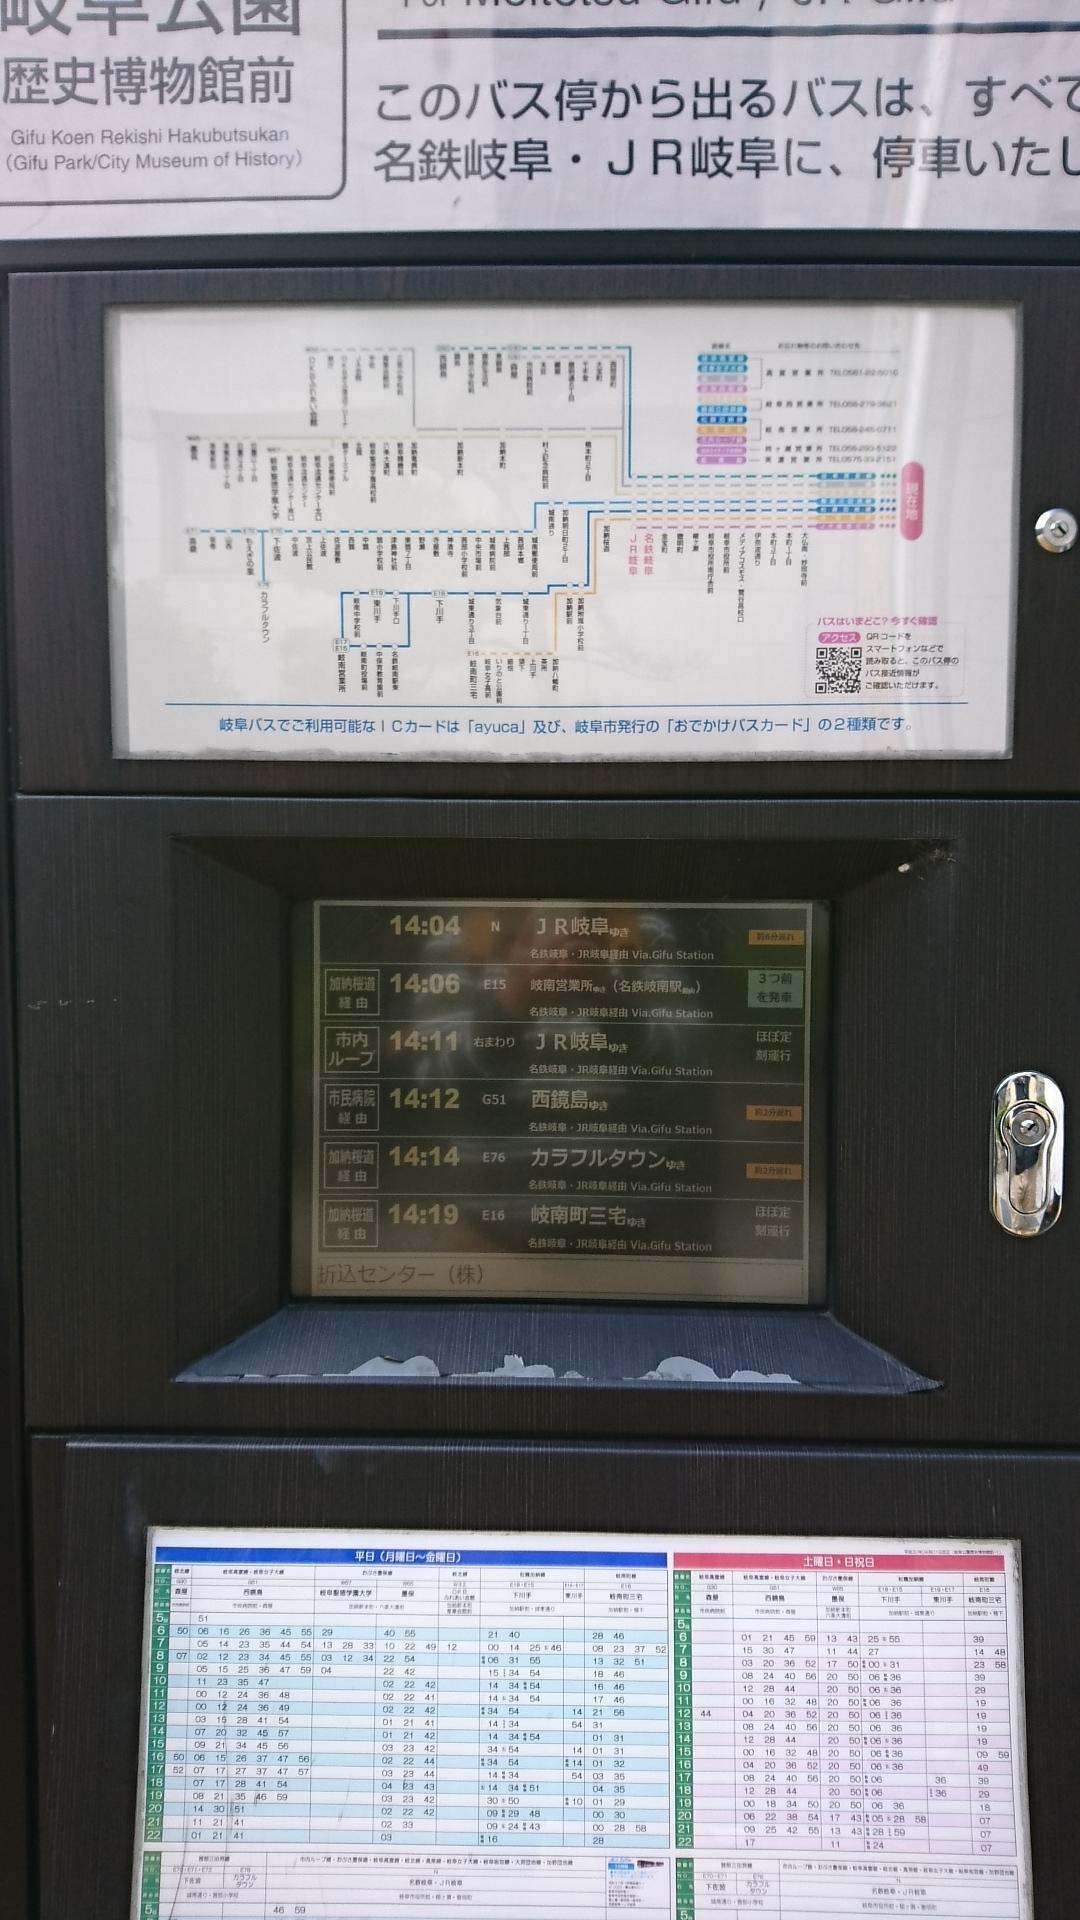 2018.5.4 岐阜 (32) 岐阜公園・歴史博物館前バス停 1080-1920